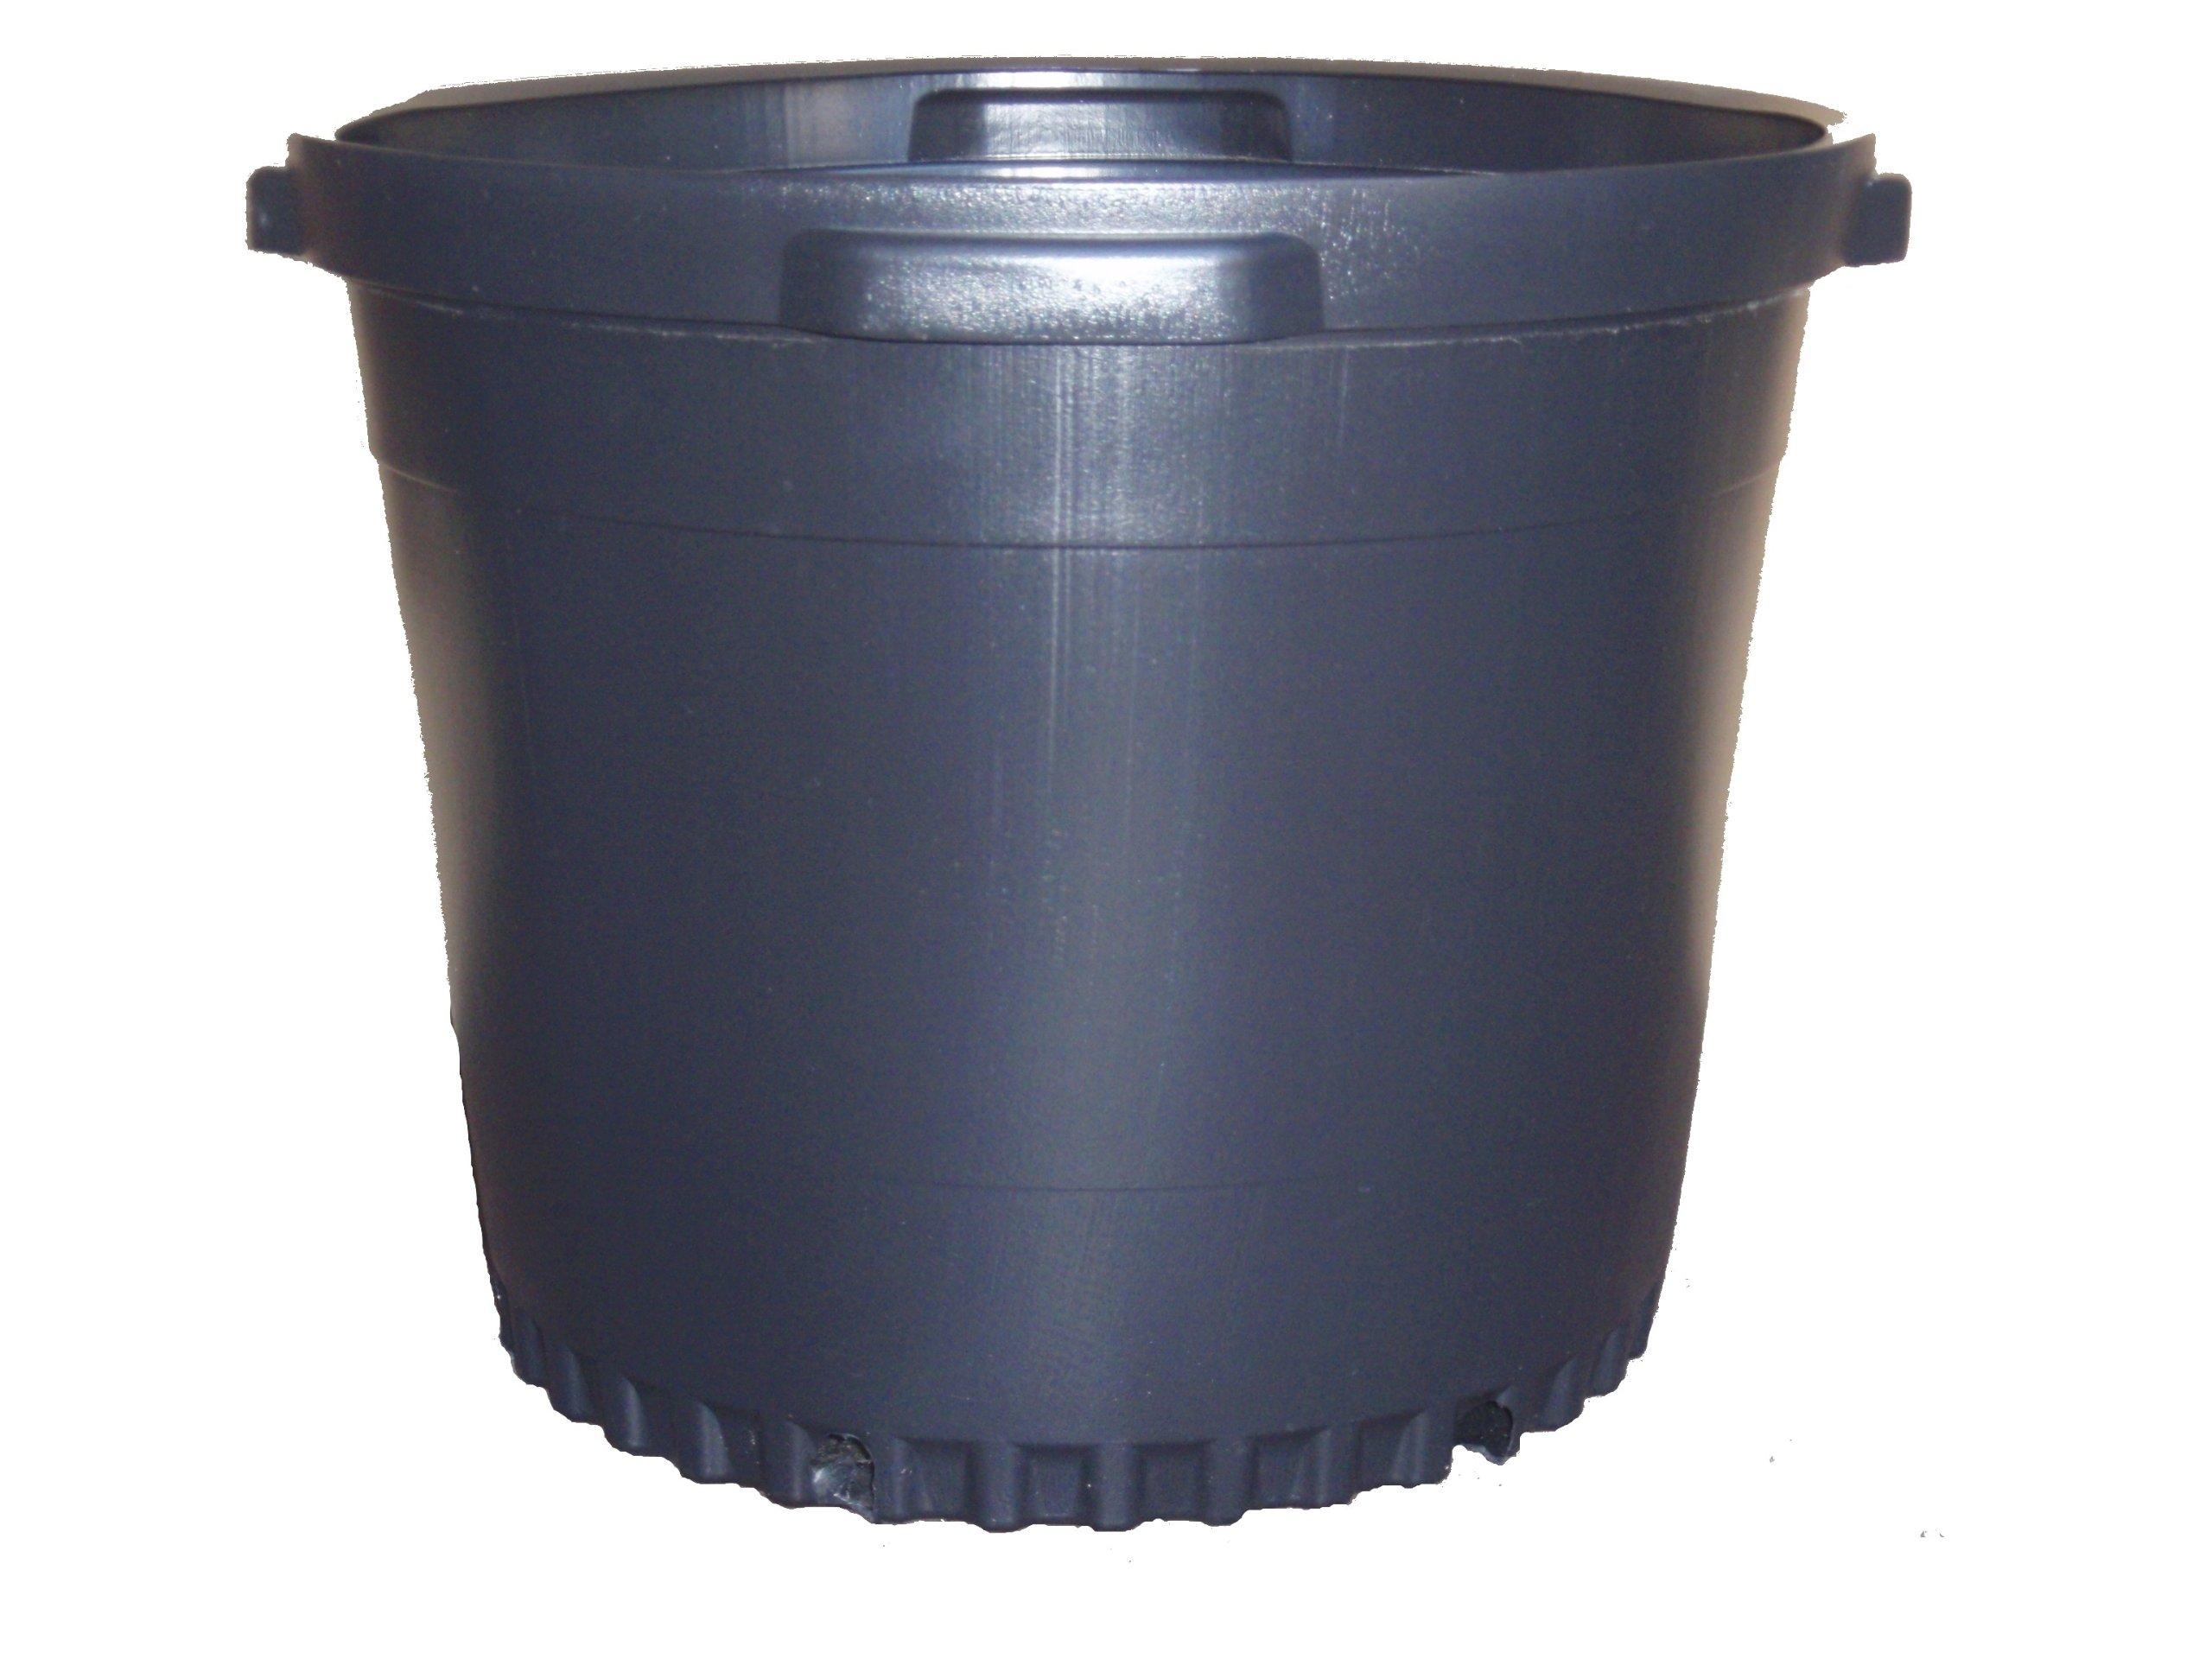 3 NEW Plastic Nursery 15 Gallon Trade POT ~ Actual Volume: 13.4 Gallons by Nursery Supplies